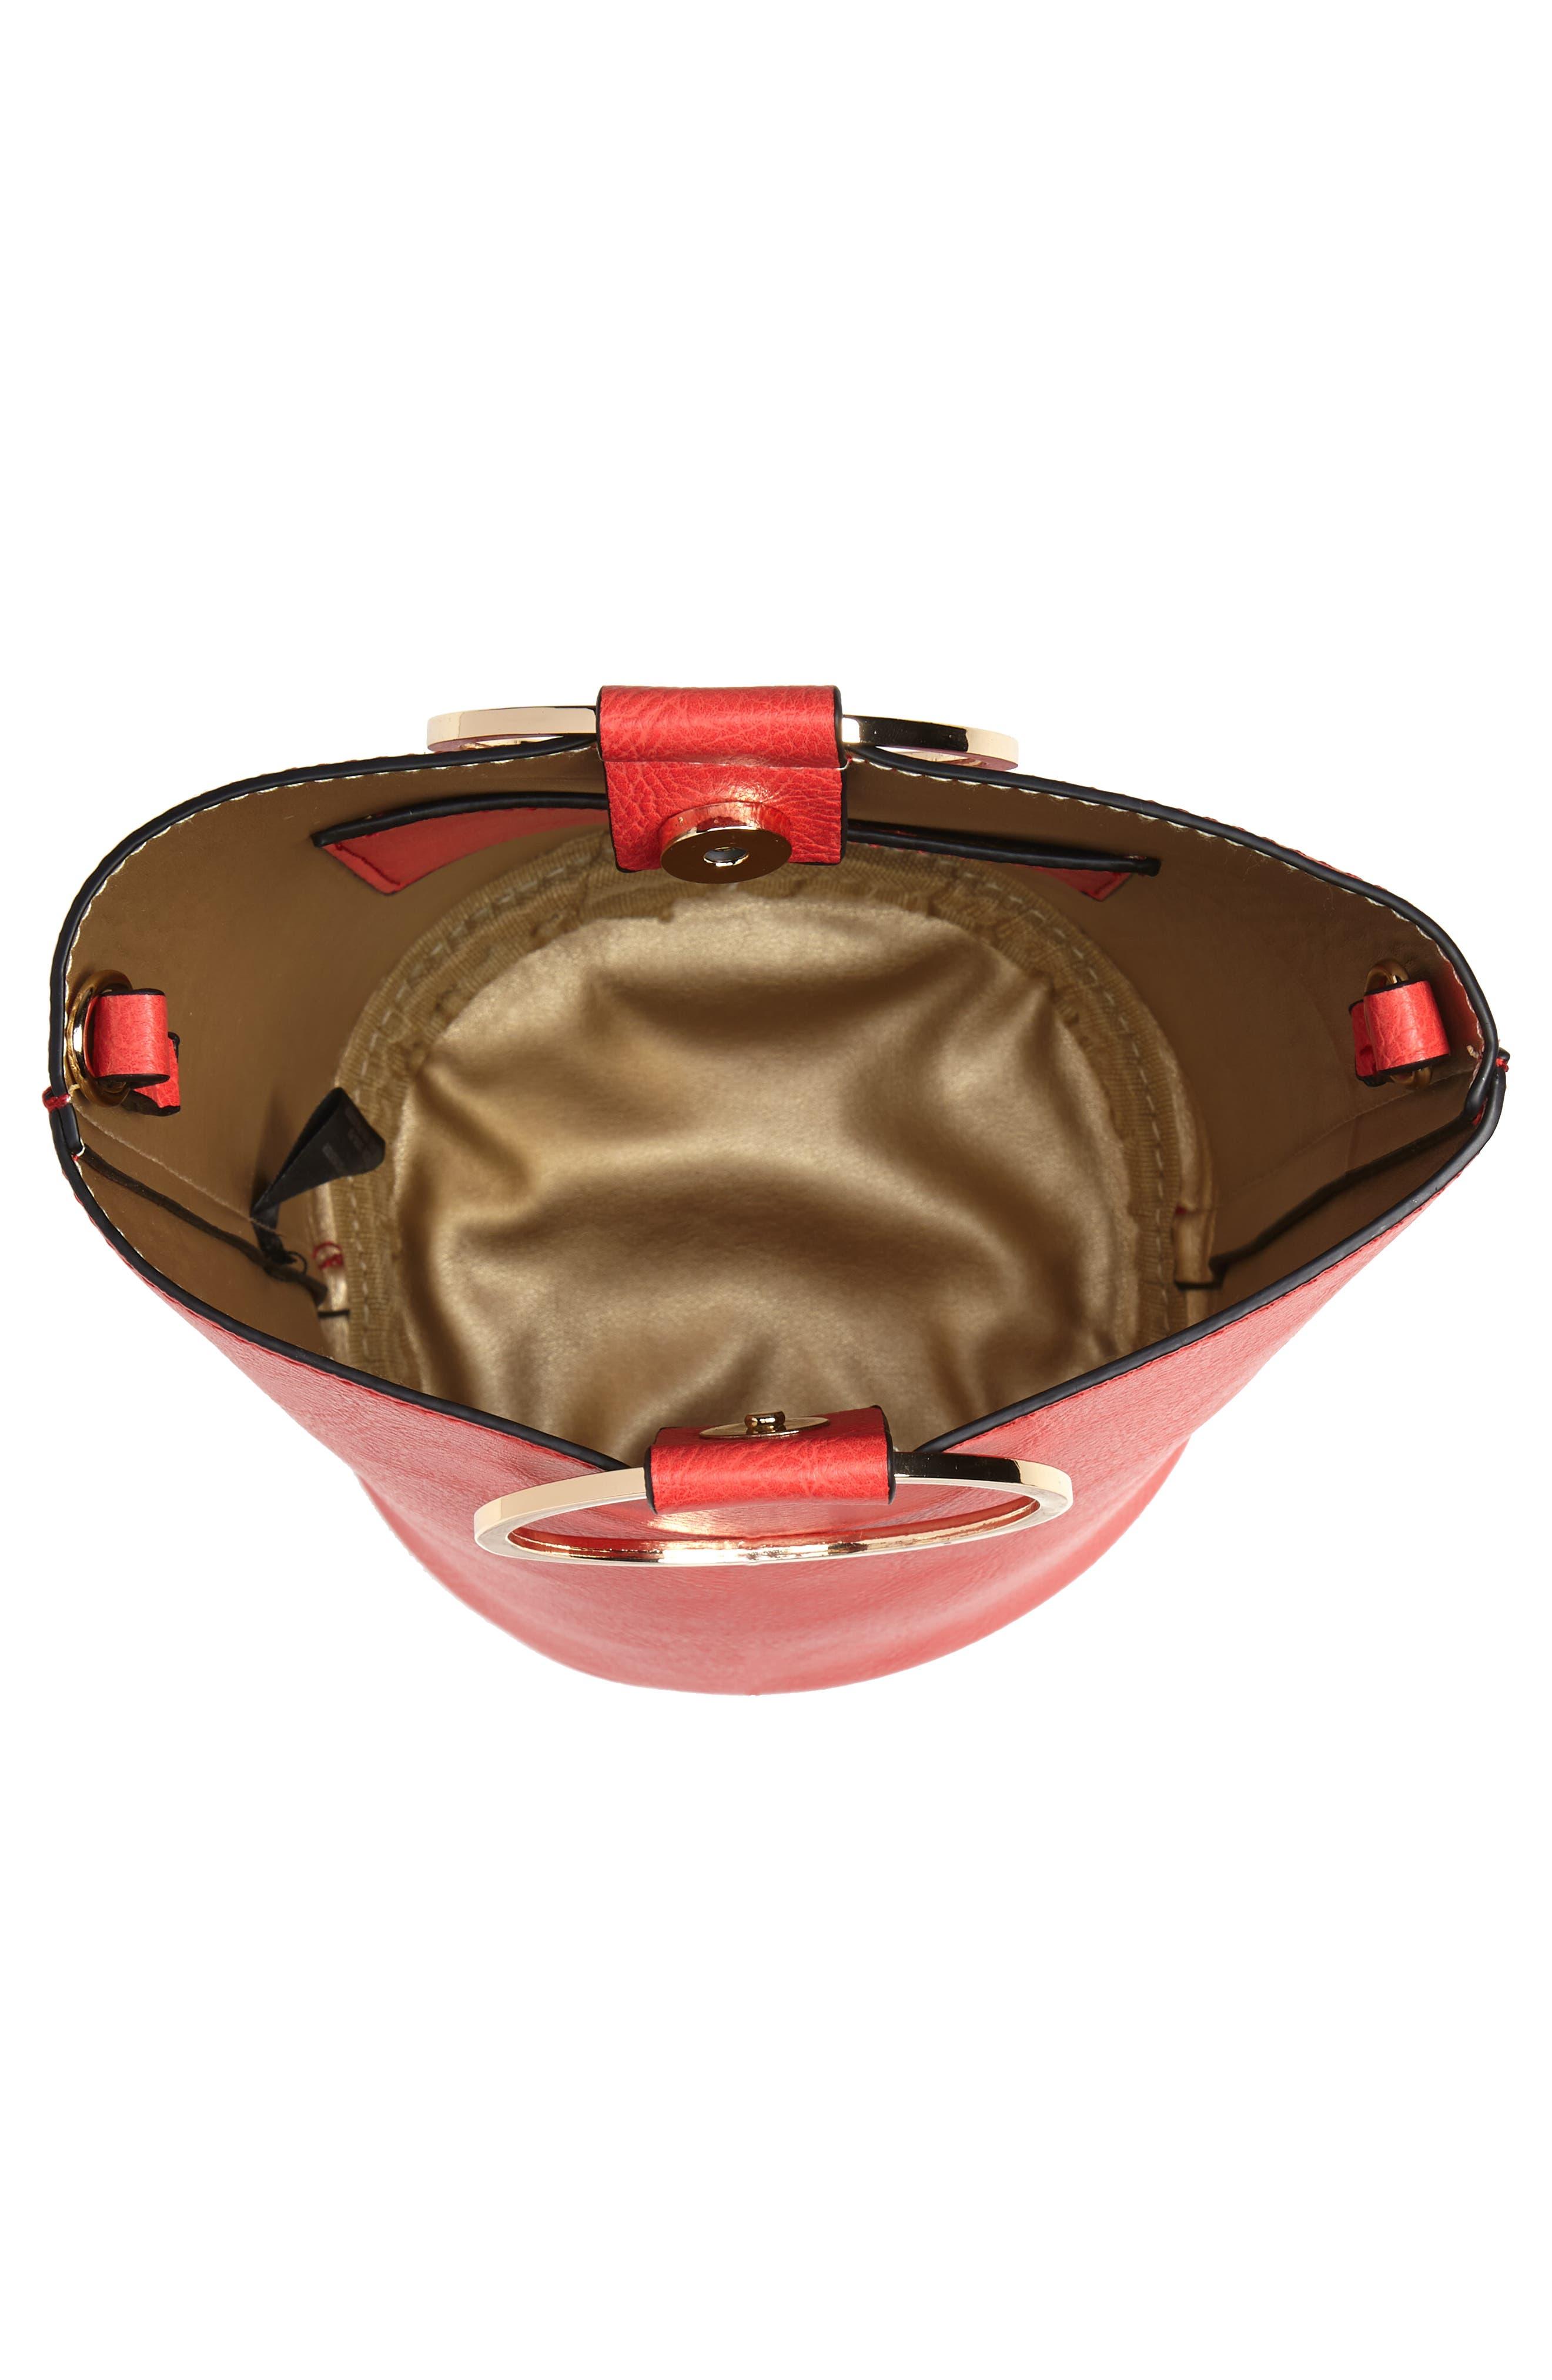 Mali + Lili Ilia Vegan Leather Ring Handle Bucket Bag,                             Alternate thumbnail 12, color,